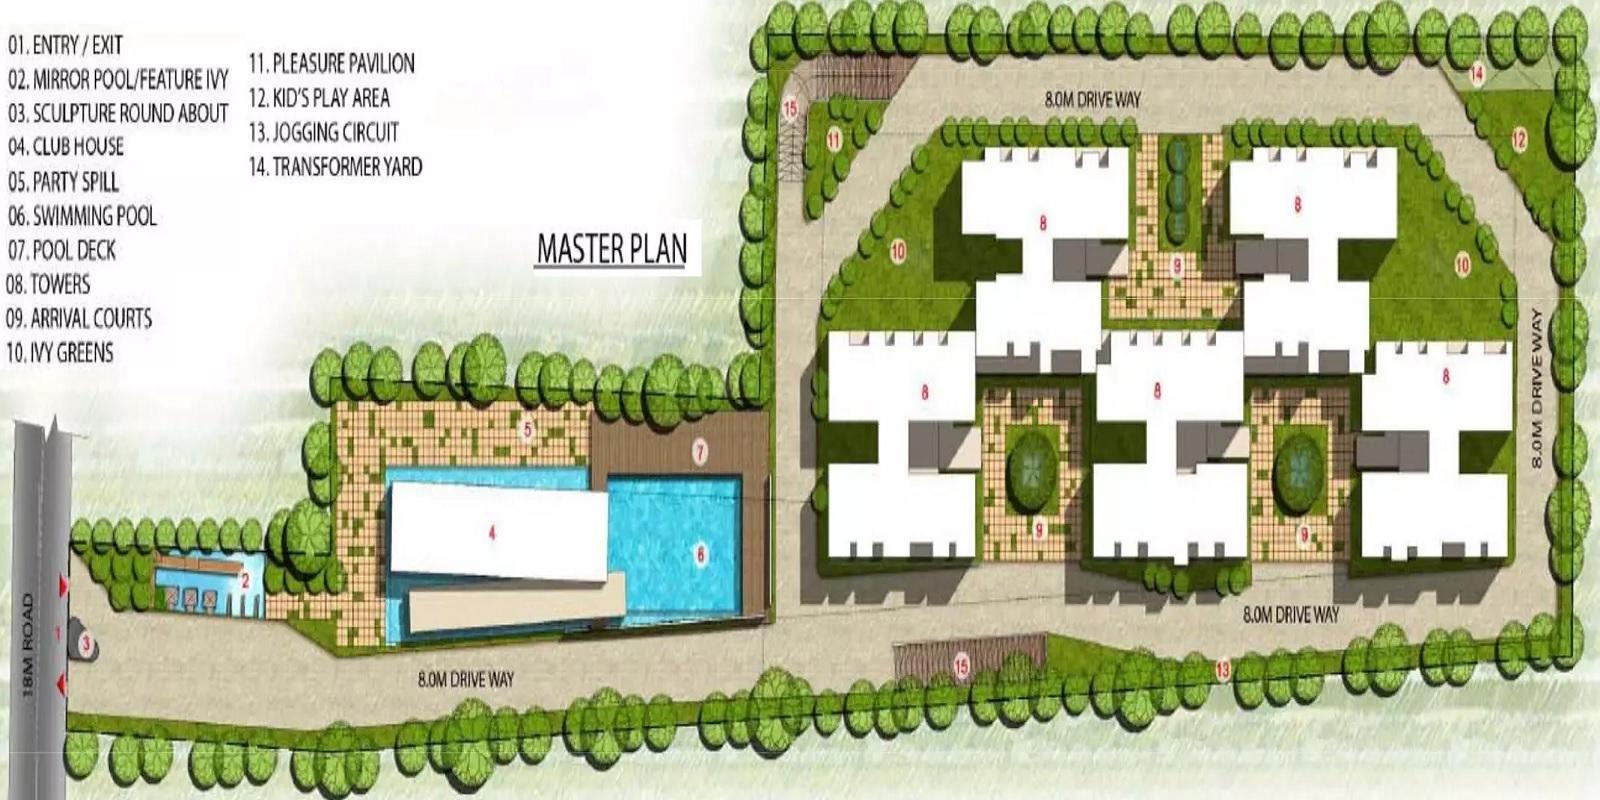 prestige ivy terraces master plan image2